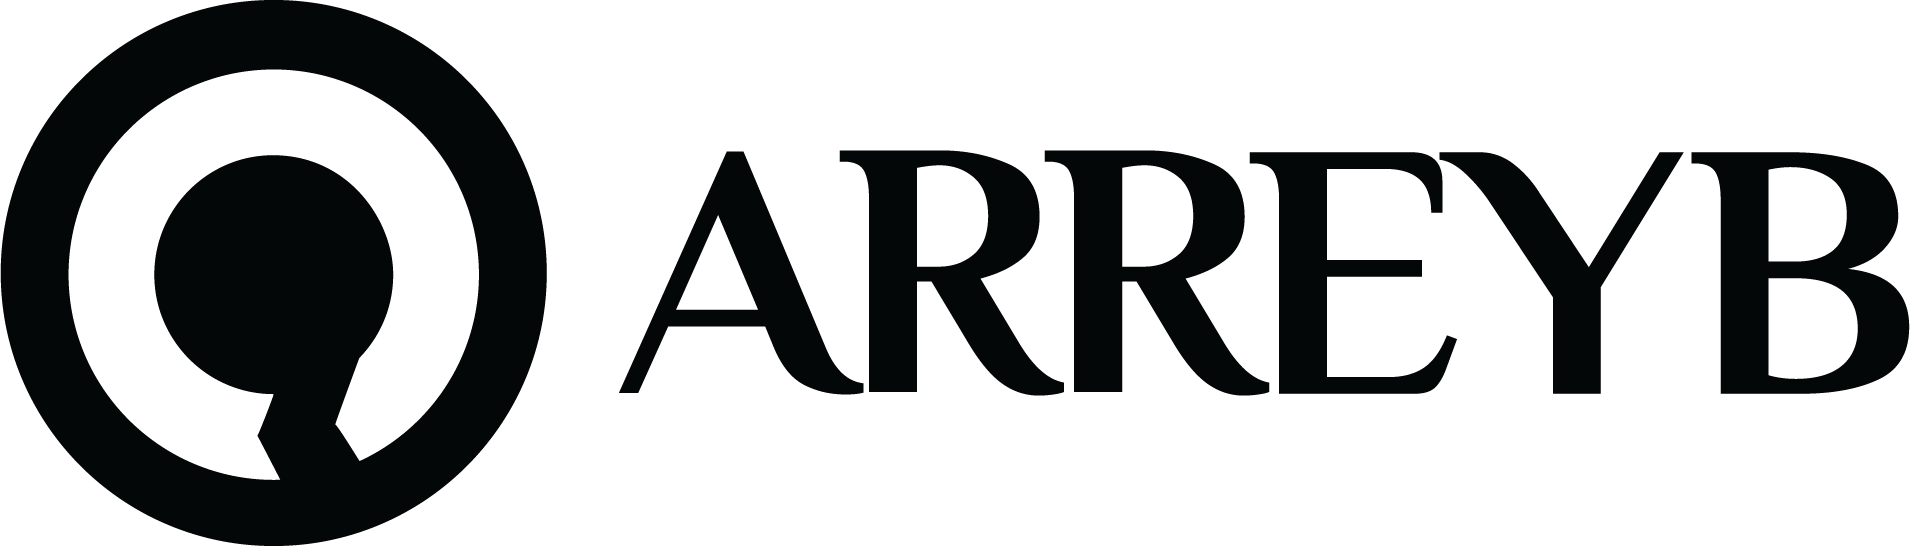 cropped-arreyb-logo-black.png